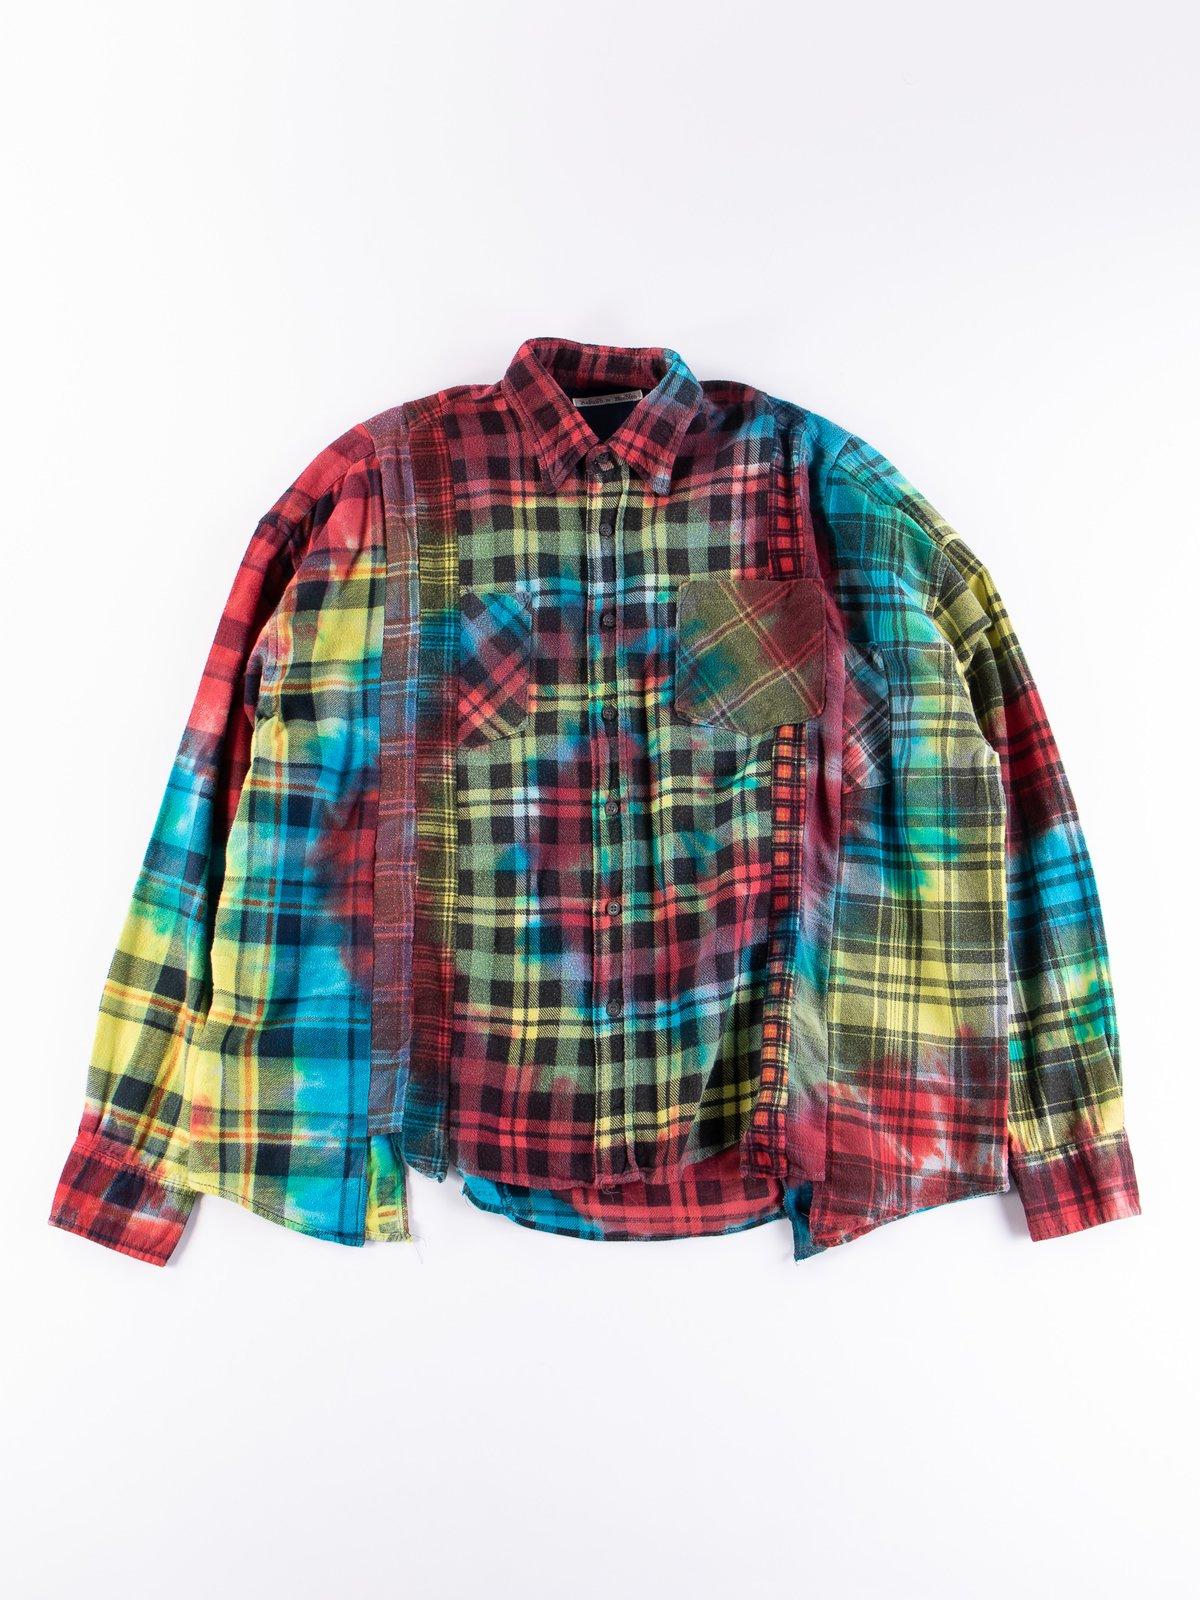 Tie Dye Assorted 7 Cuts Rebuild Shirt - Image 1